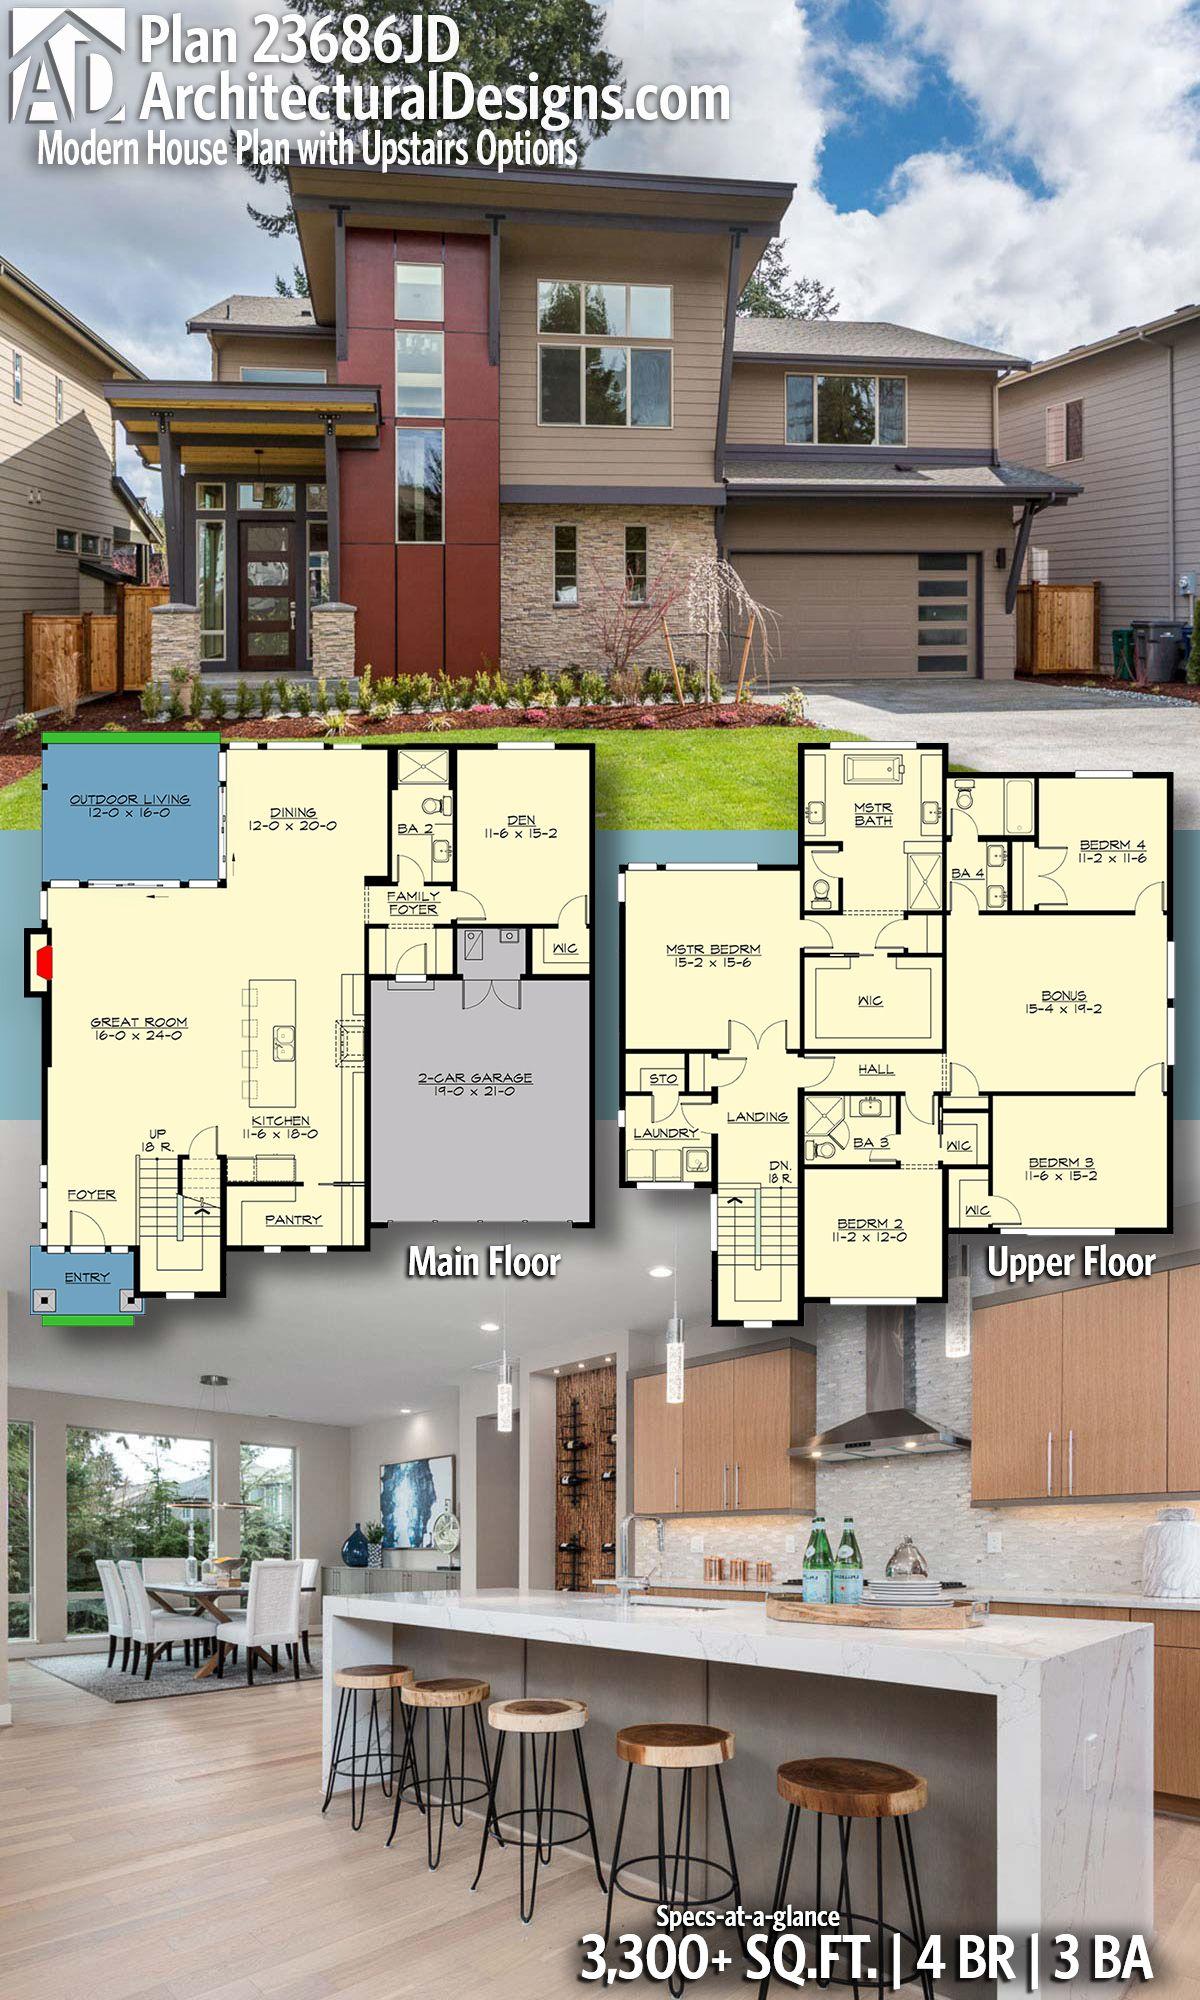 Architecture Architectural Designs Exclusive House Plan